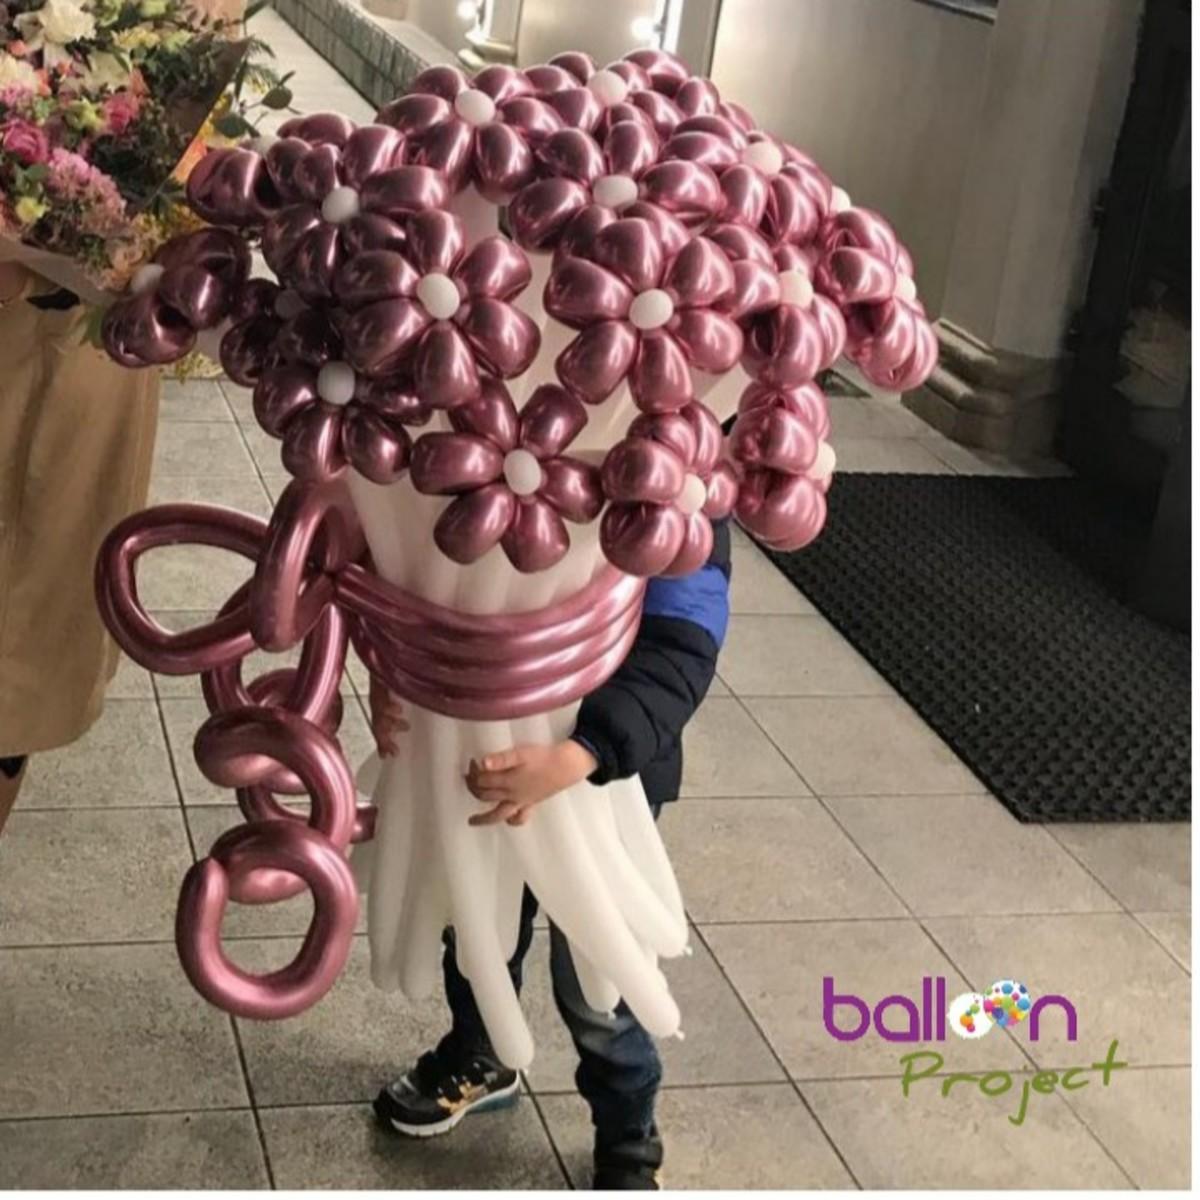 Chrome Balloons 2020 Trend